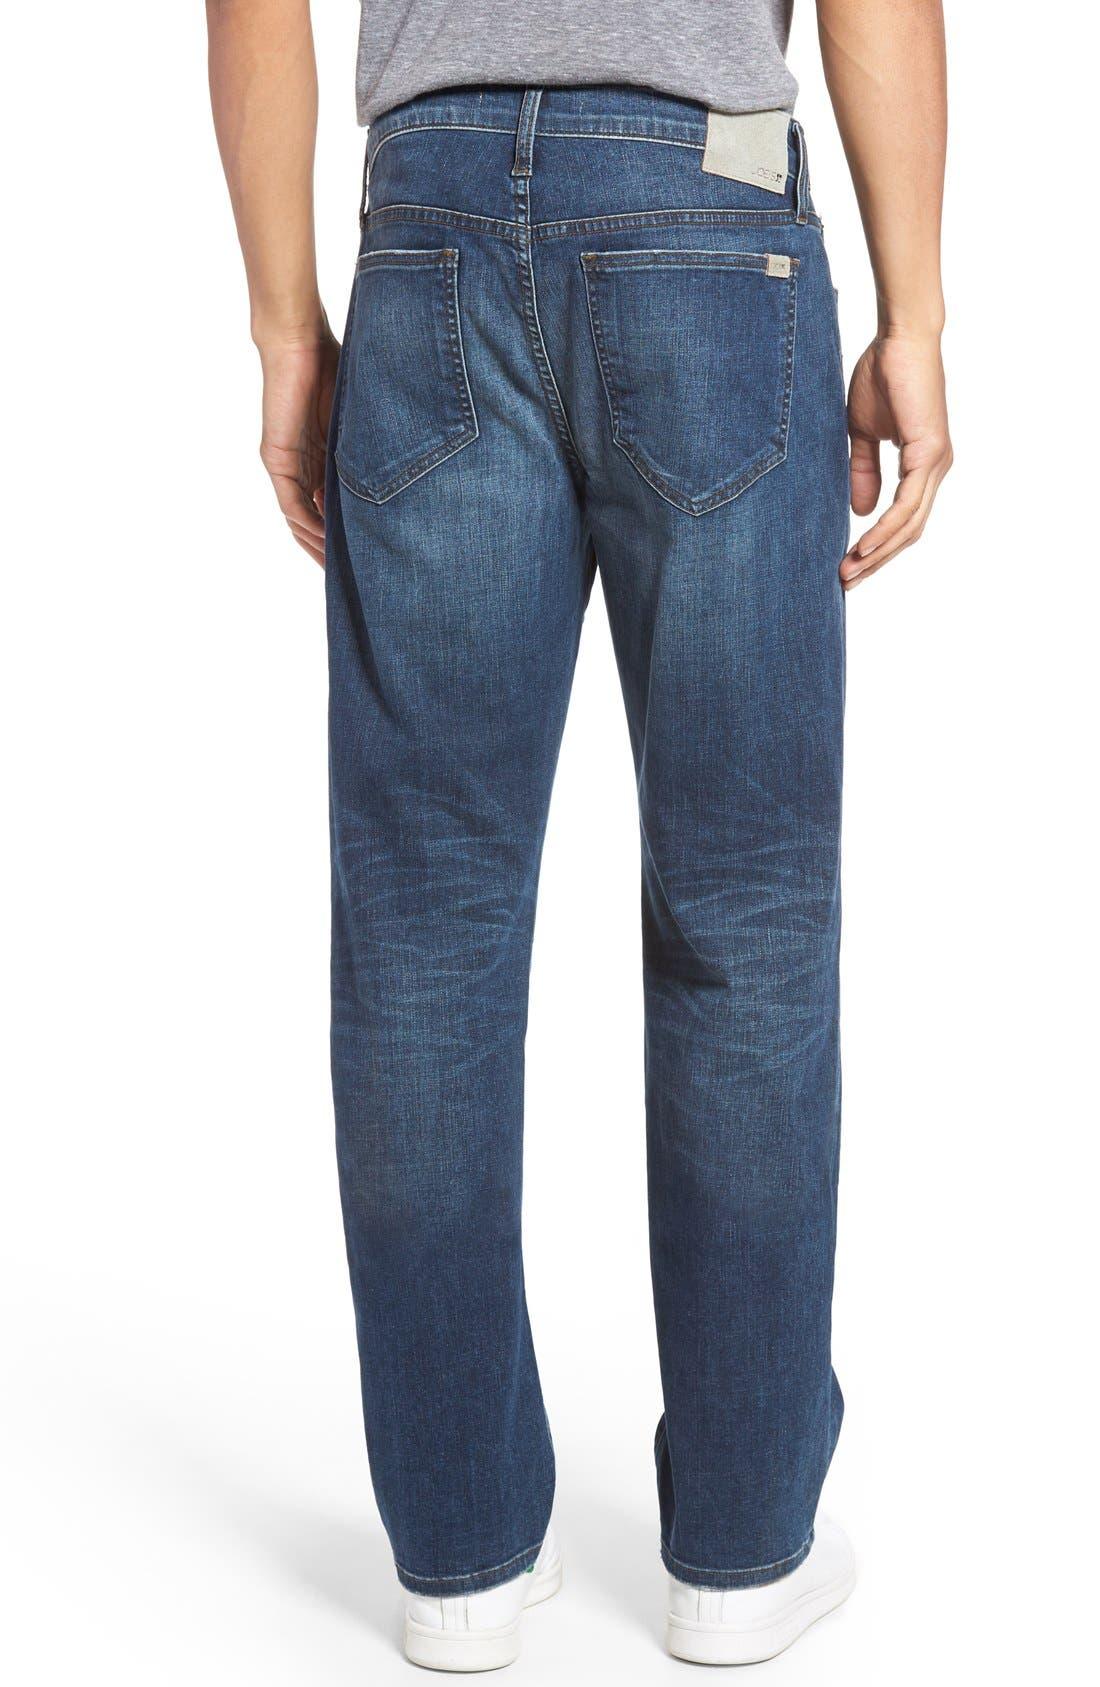 Brixton Slim Fit Jeans,                             Alternate thumbnail 2, color,                             Gladwin